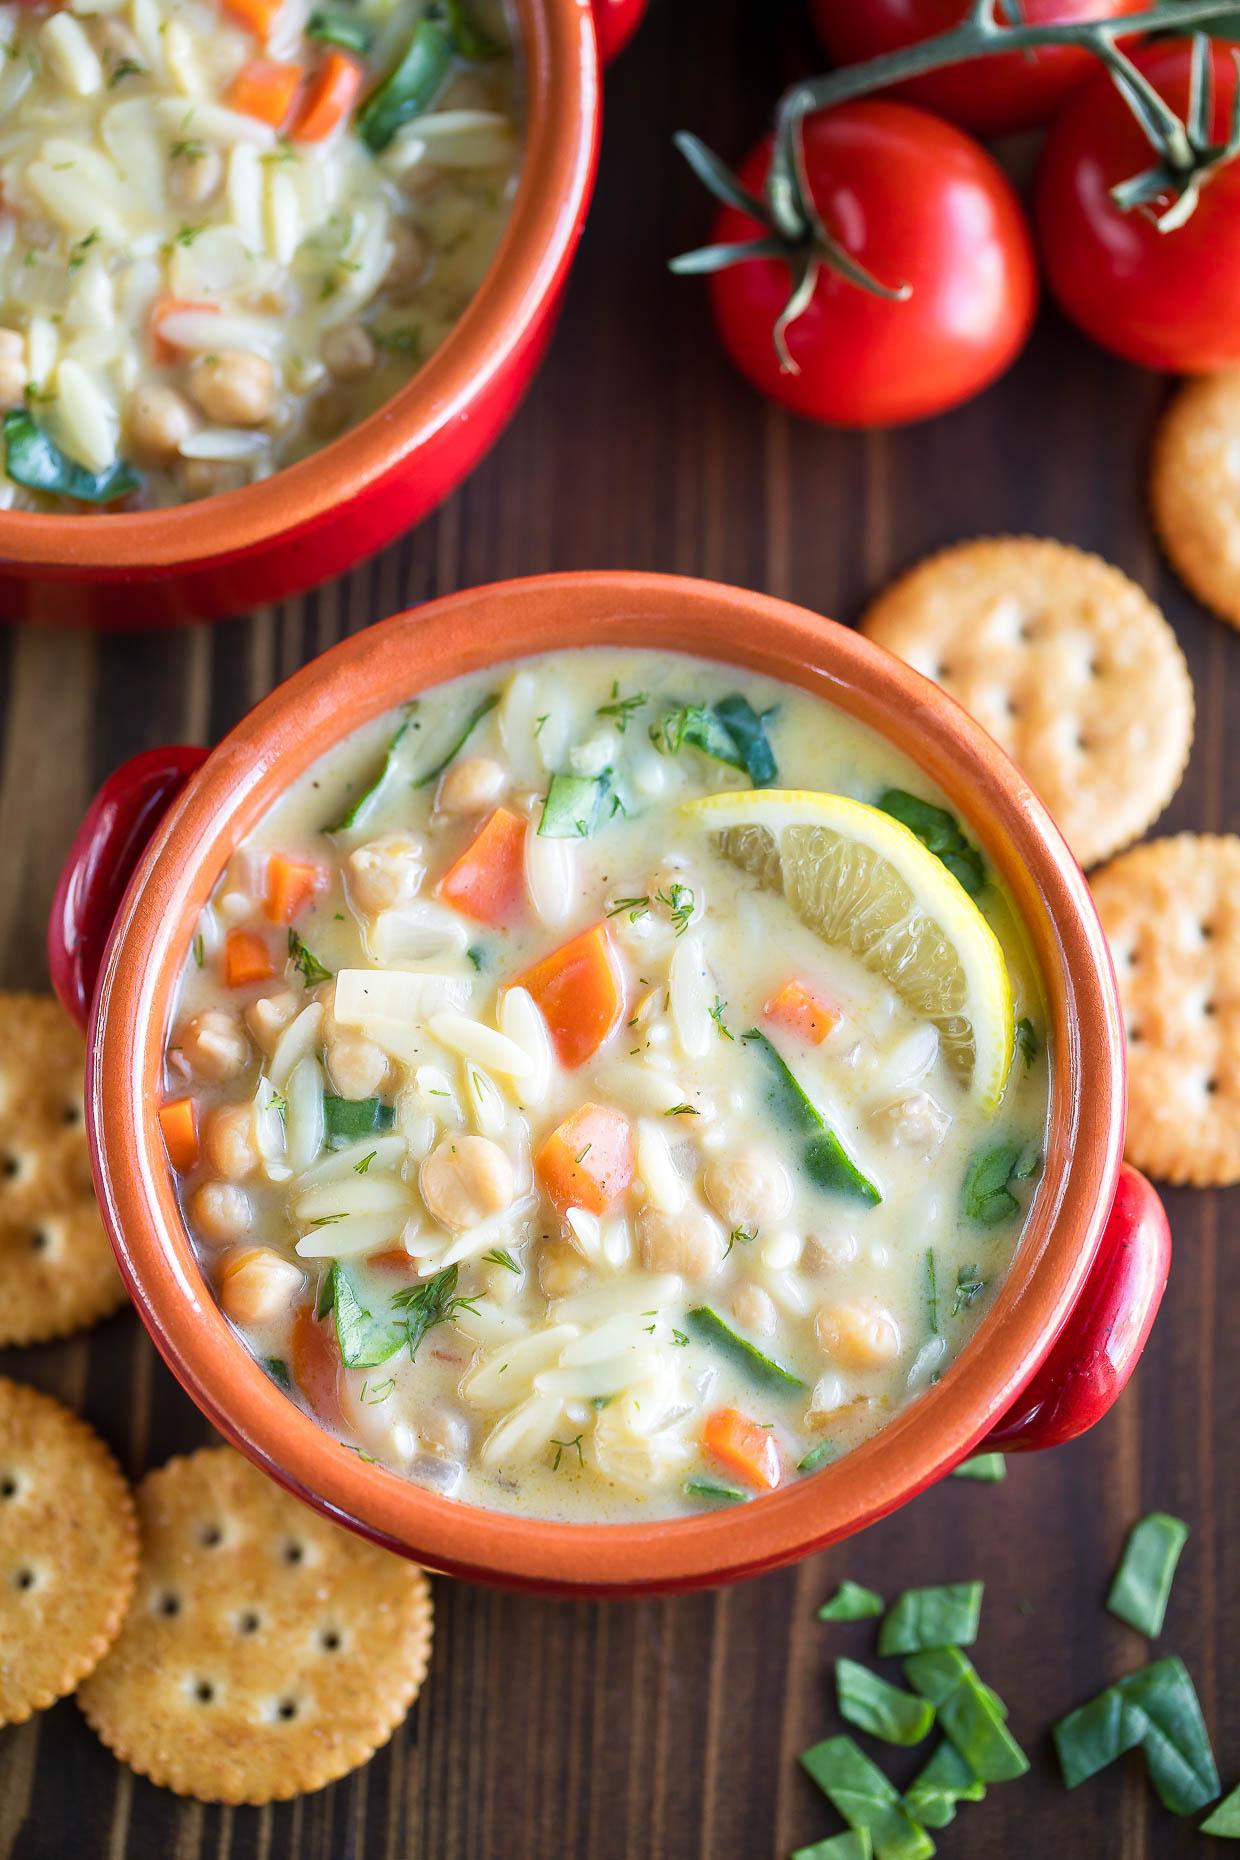 Lemon Orzo Soup with Chickpeas